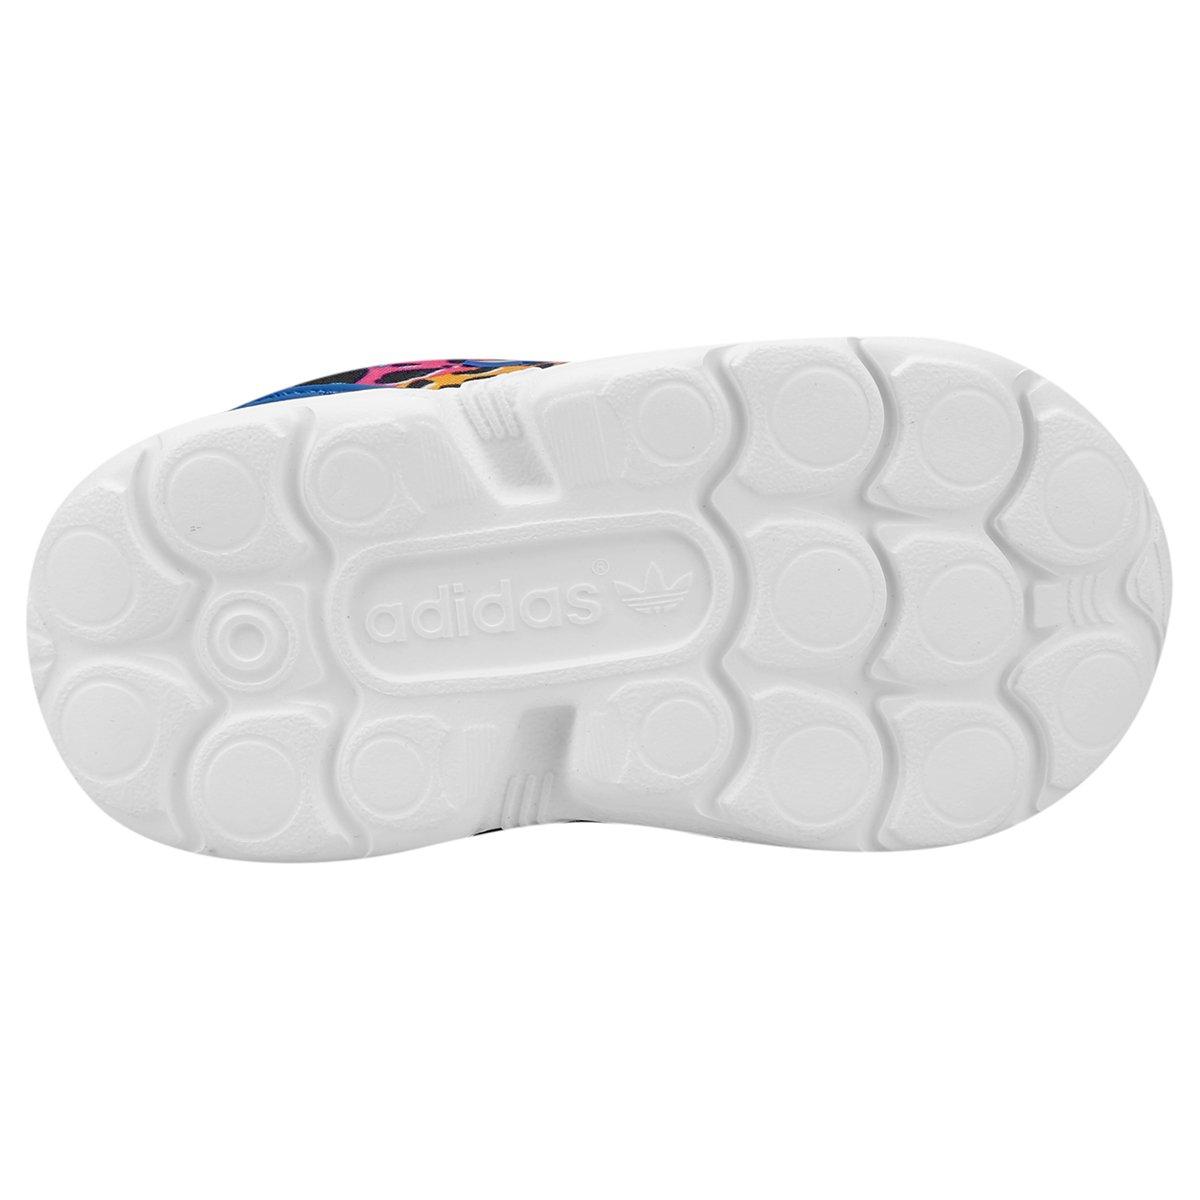 Tênis Adidas Zx Flux 360 I Infantil - Compre Agora  0695531ce67c4